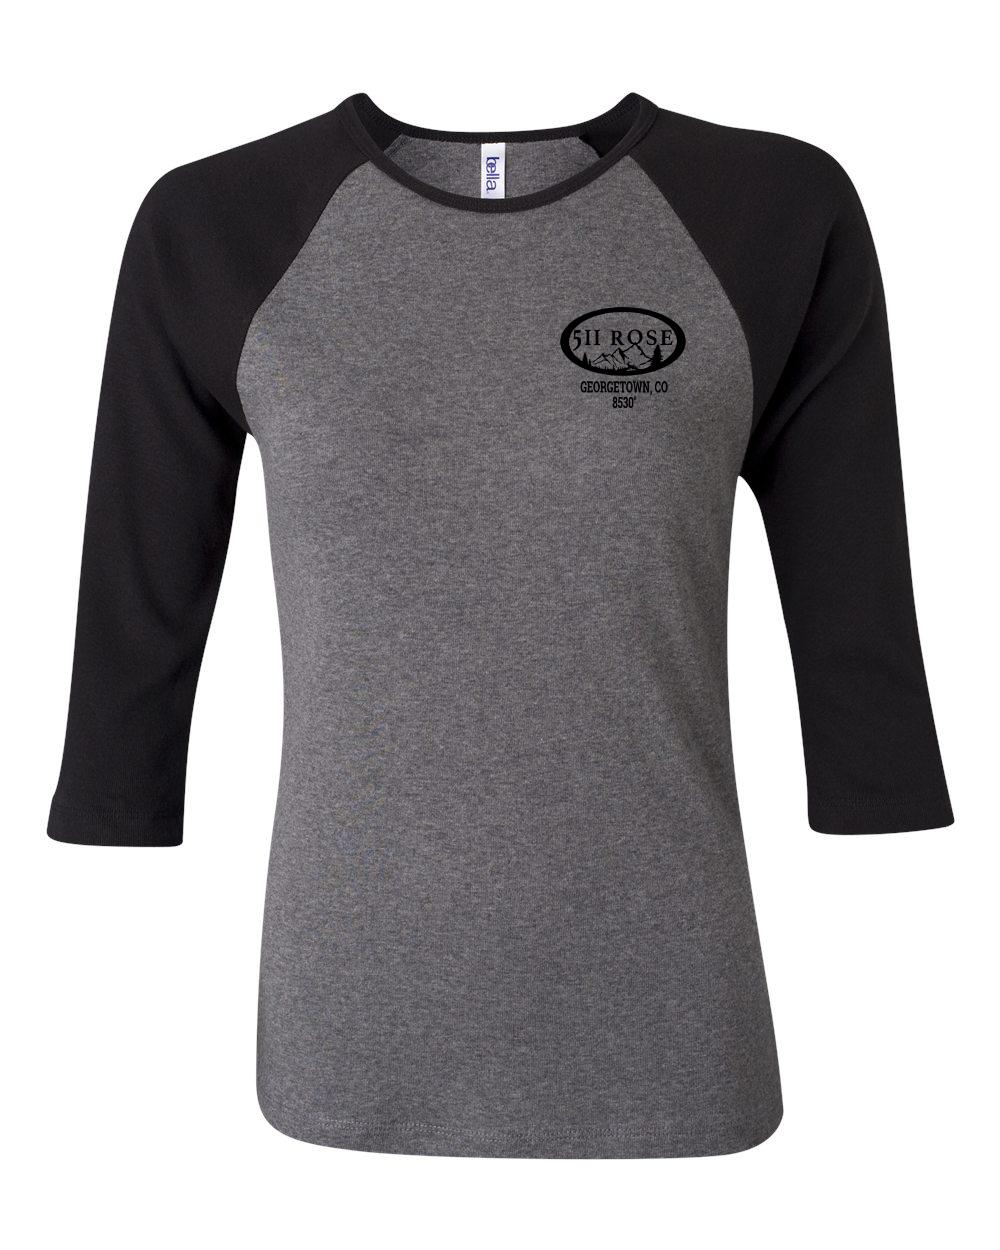 custom design of Bella BB2000  Women's Baby Rib Contrast 3/4 Sleeve Raglan T-Shirt